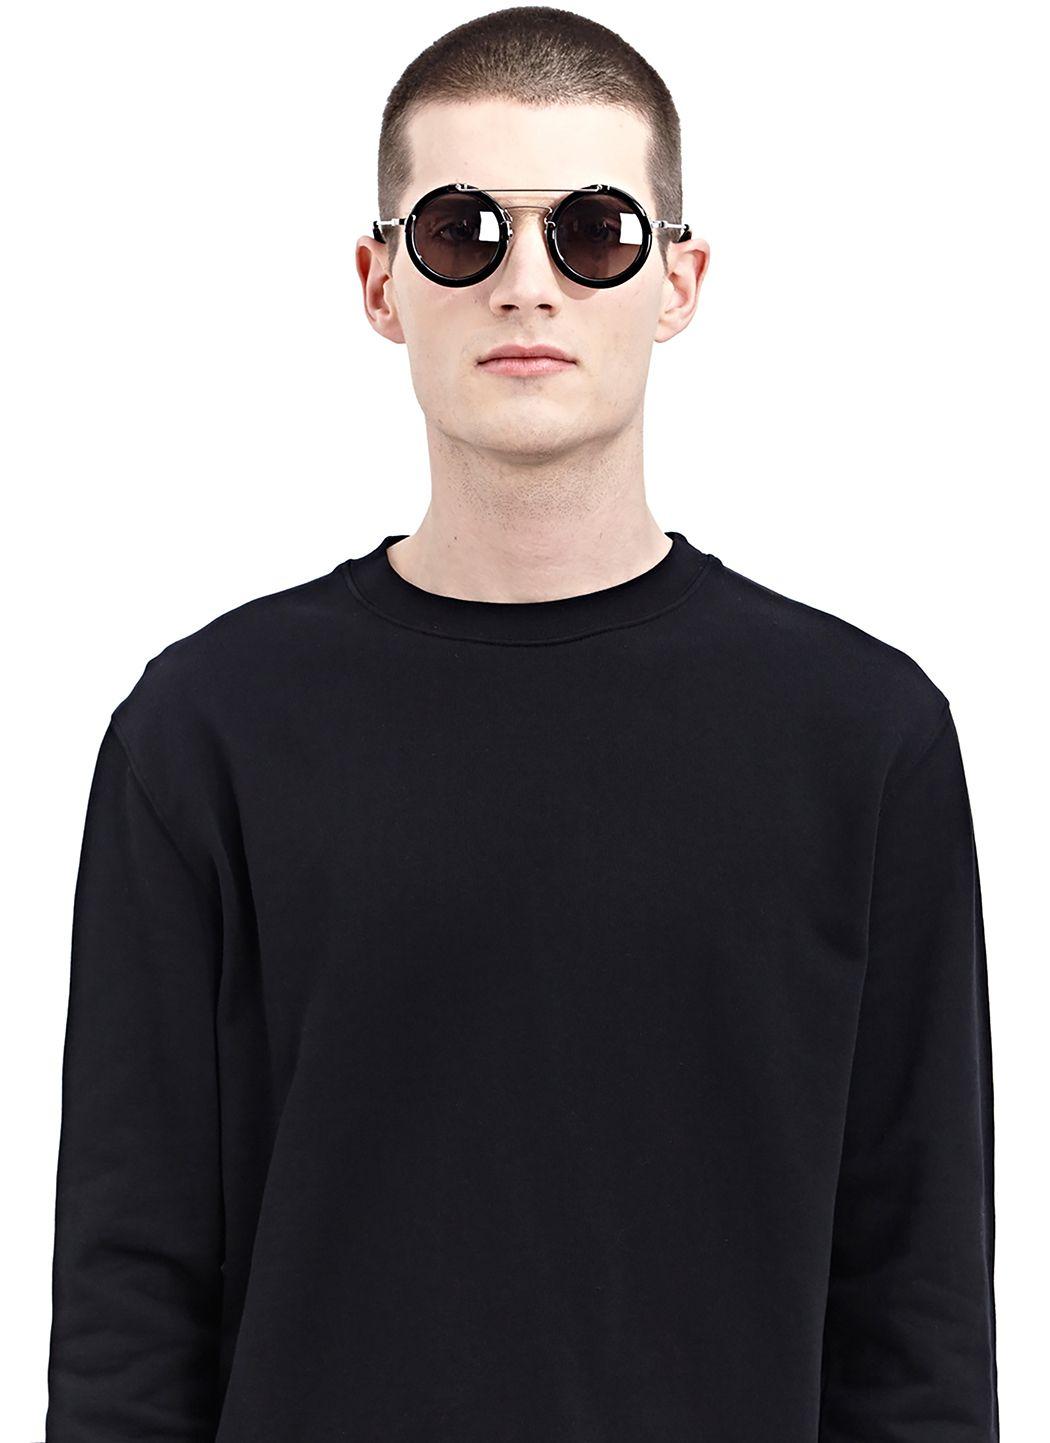 f778f20cc Yohji Yamamoto YY5006 Sunglasses | Apparel + Accessories ...